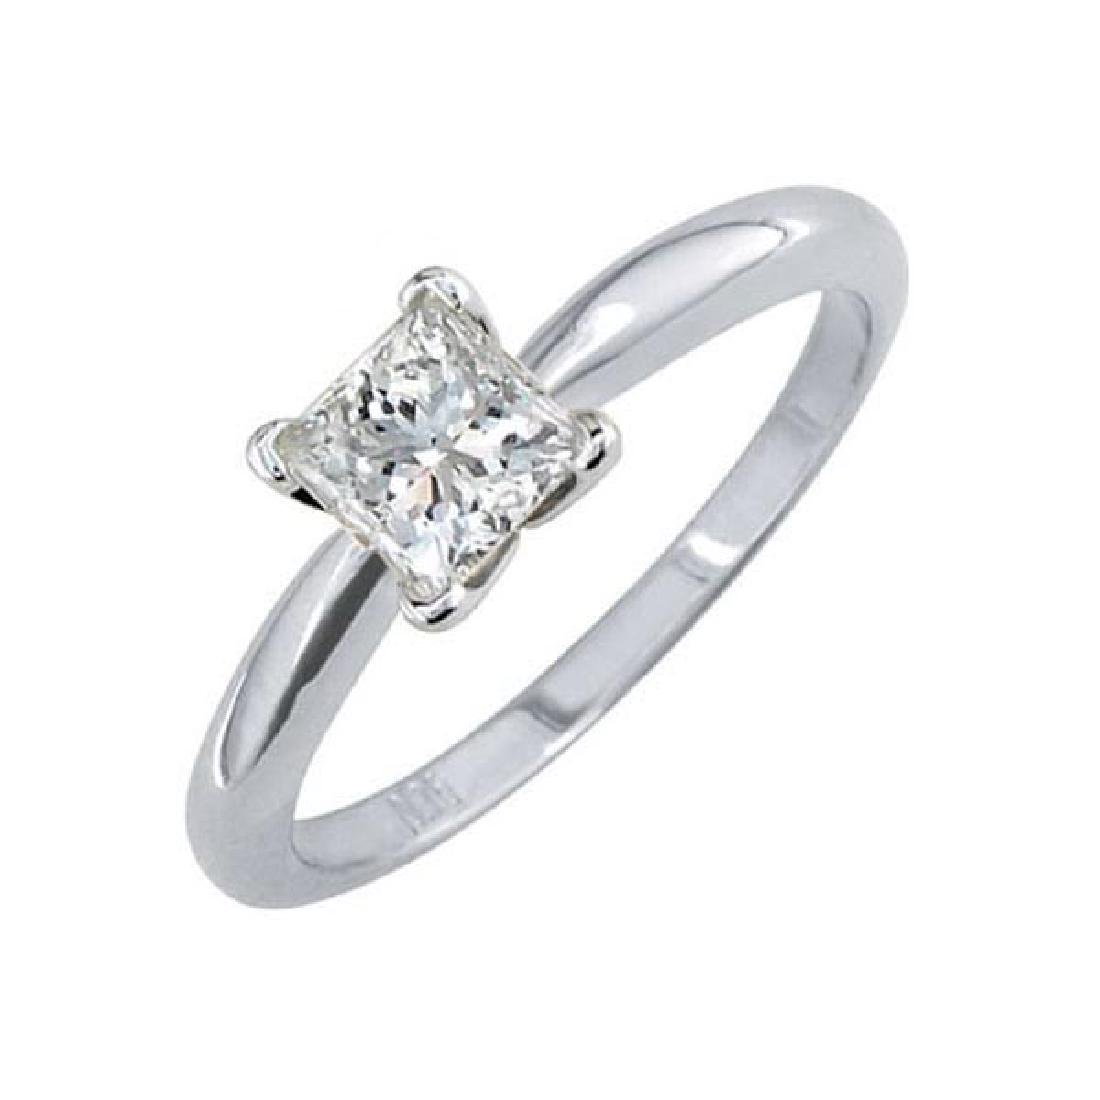 Certified 0.5 CTW Princess Diamond Solitaire 14k Ring F